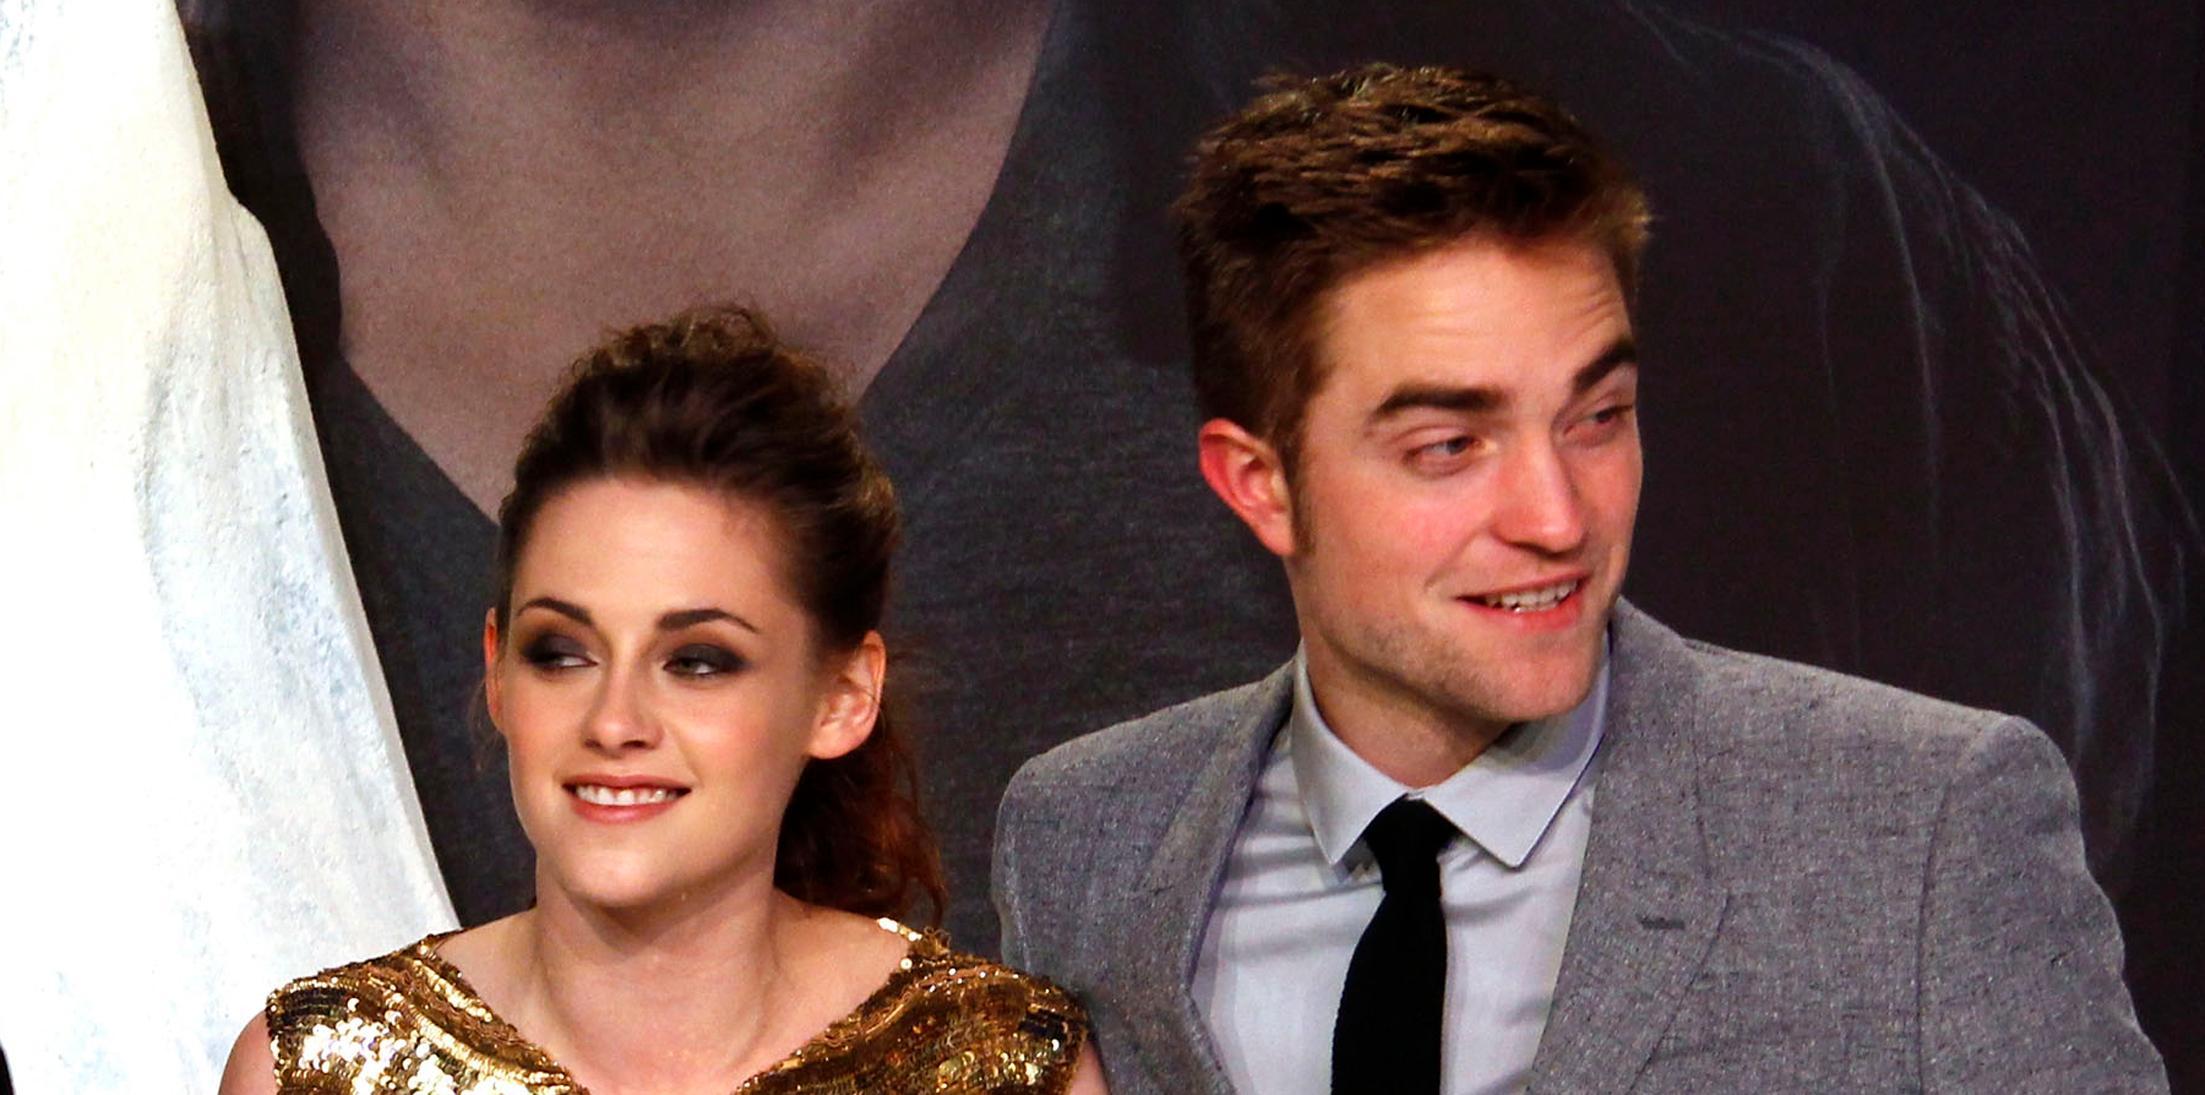 The Twilight Saga: Breaking Dawn Part 2 – Germany Premiere